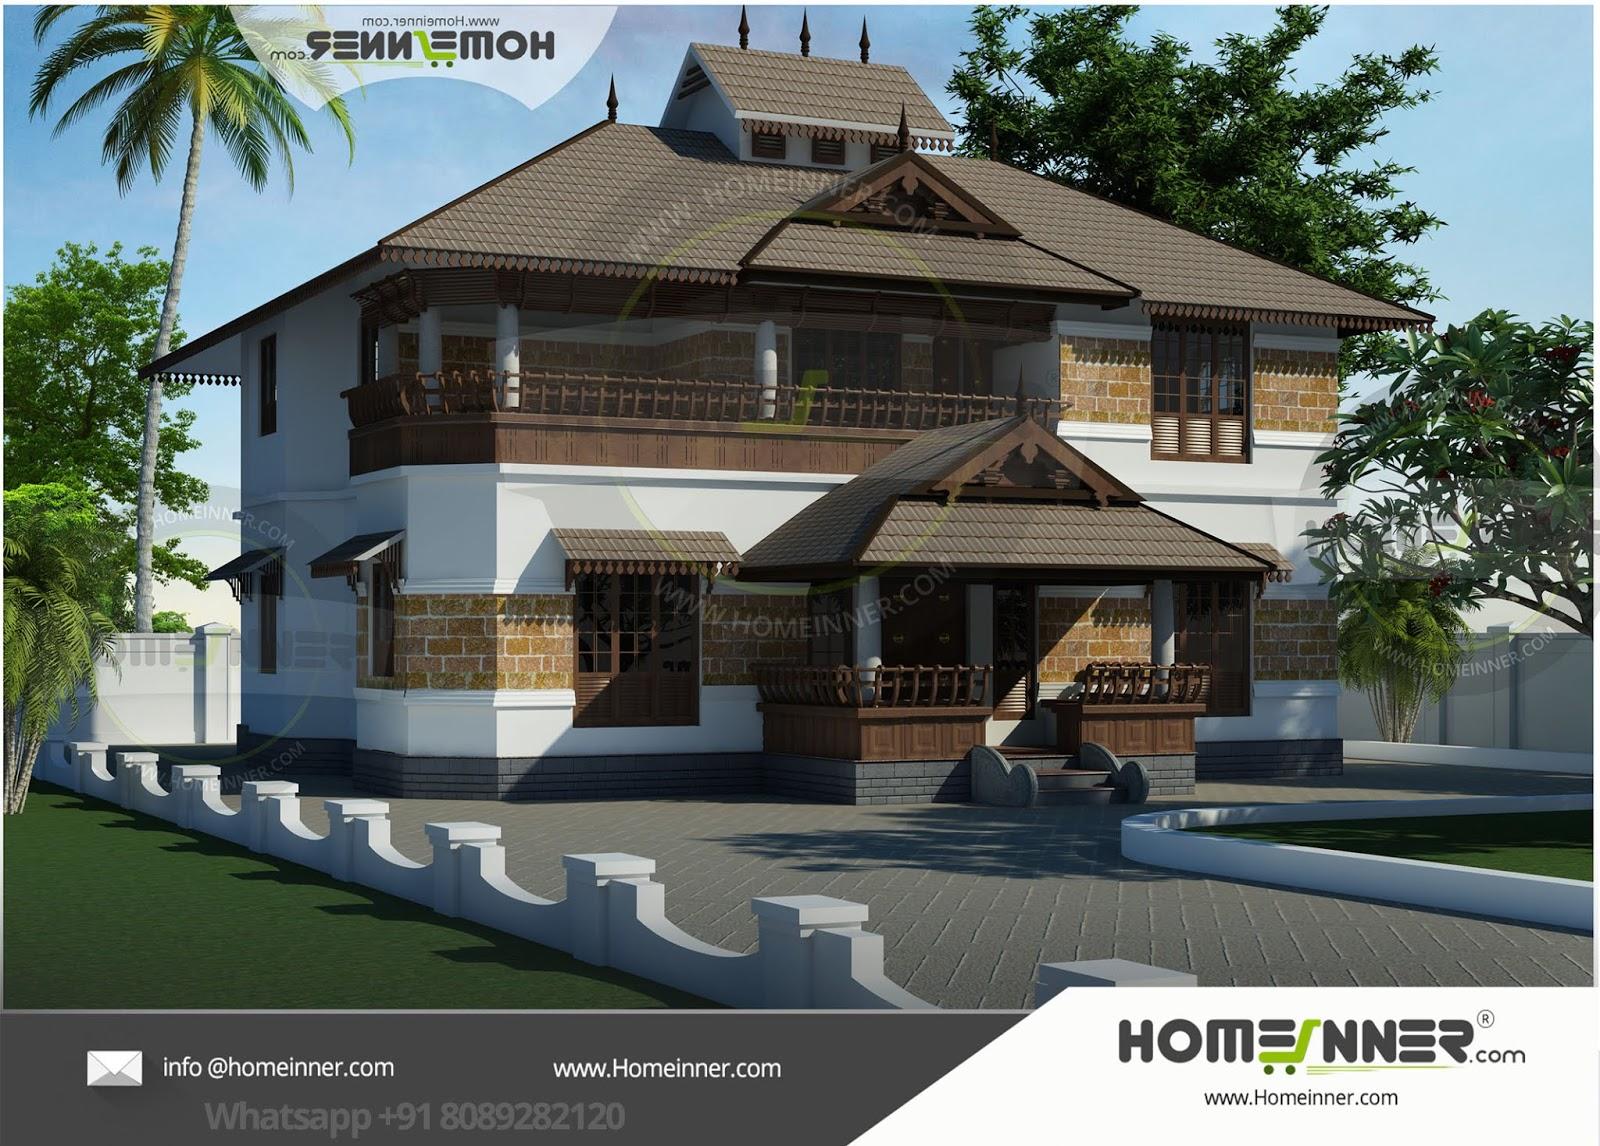 35 Lakh 5 BHK 2495 sq ft Alappuzha Villa